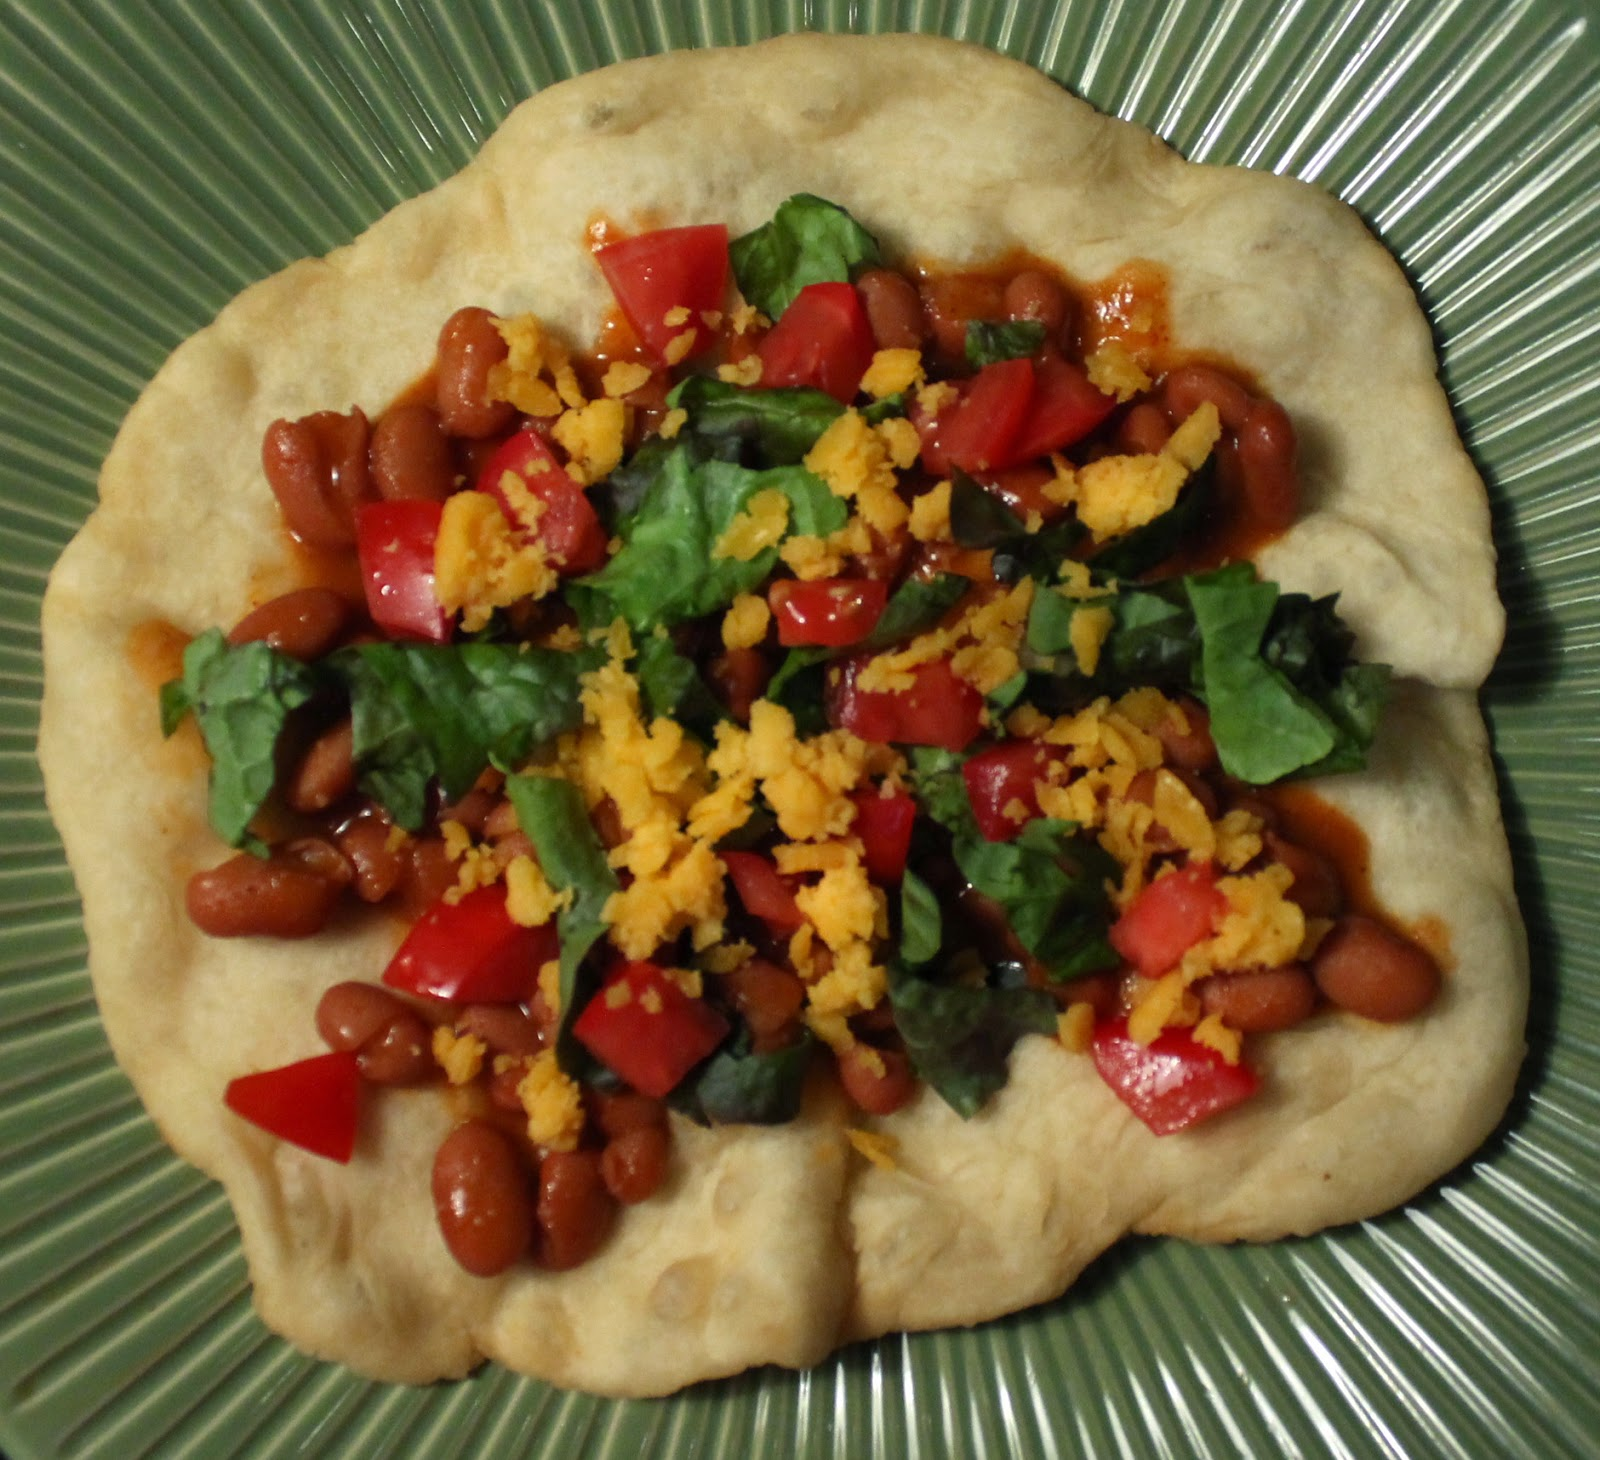 The 99 Cent Chef Frybread Taco Recipe